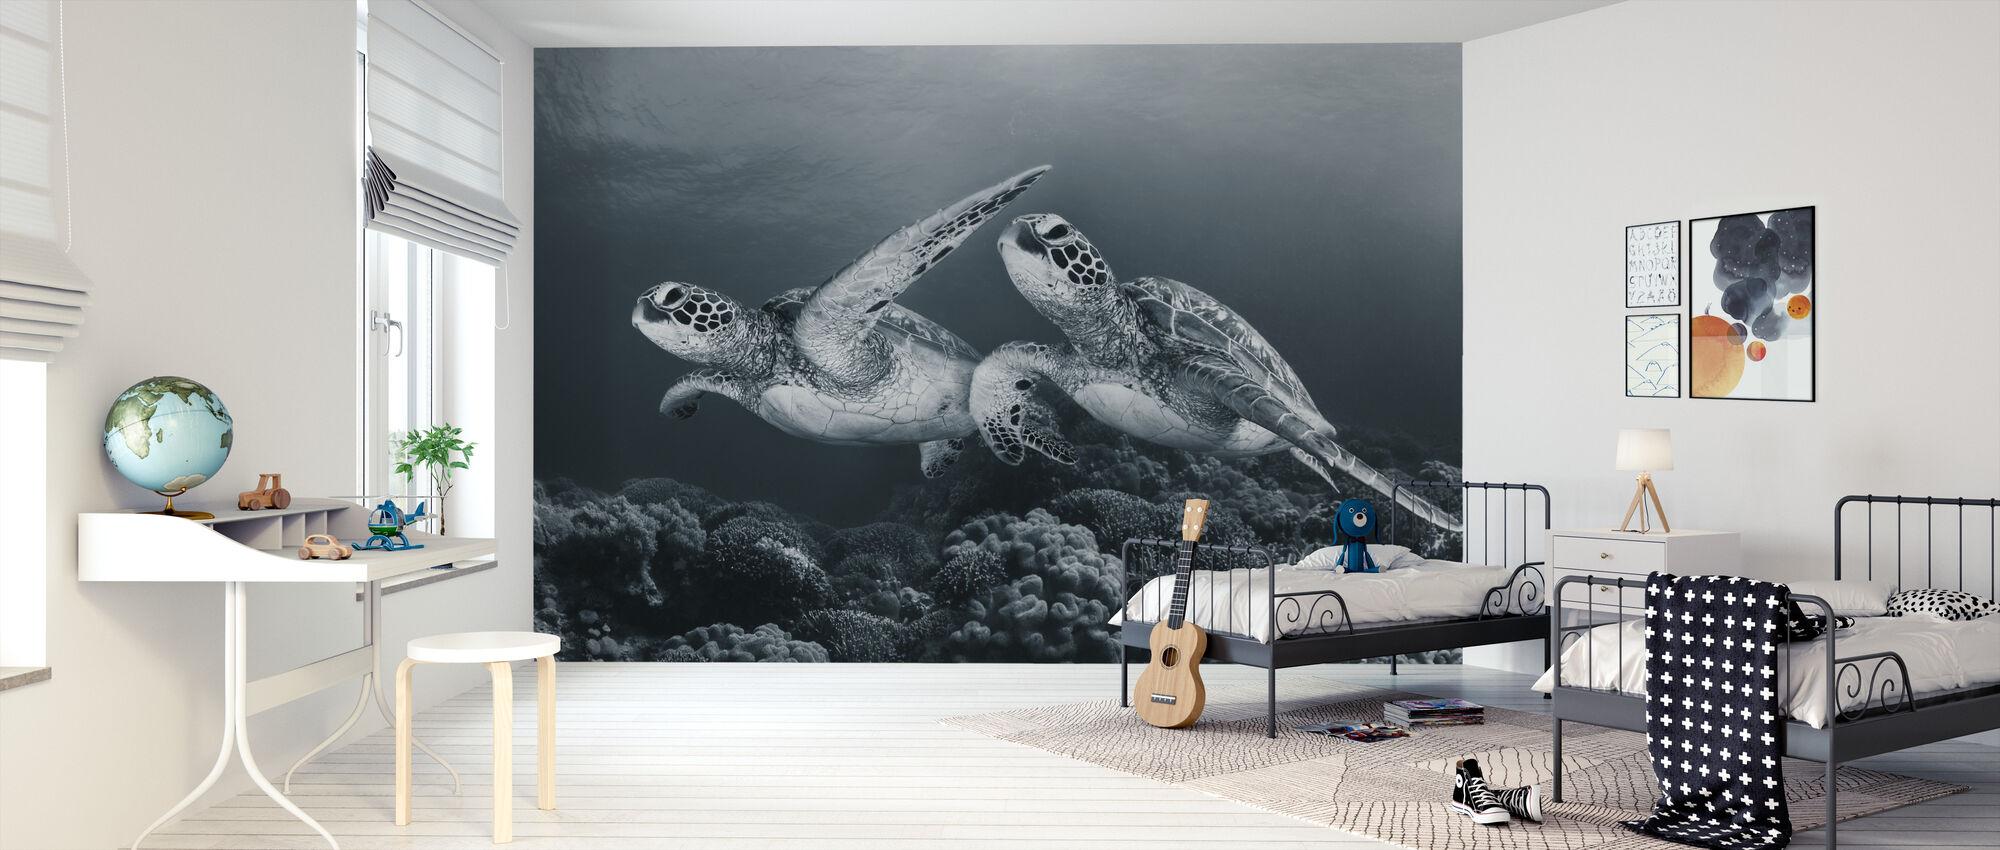 Twin Dance - Wallpaper - Kids Room